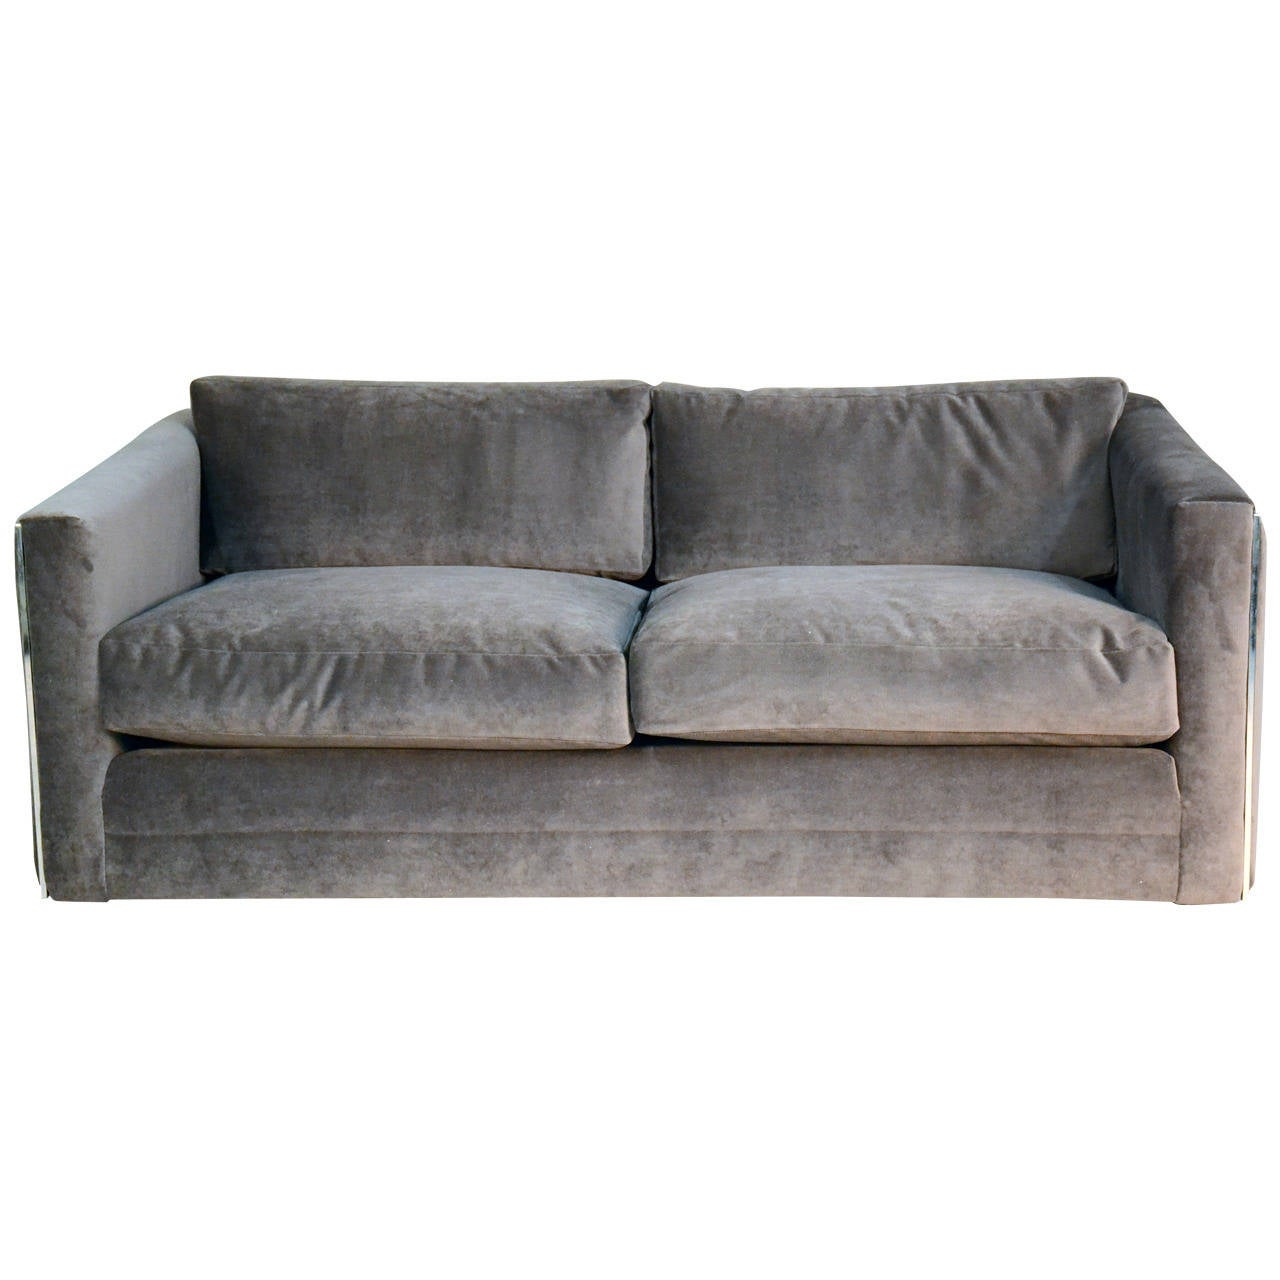 Milo Baughman For Thayer Coggin Velvet And Chrome Sofa At